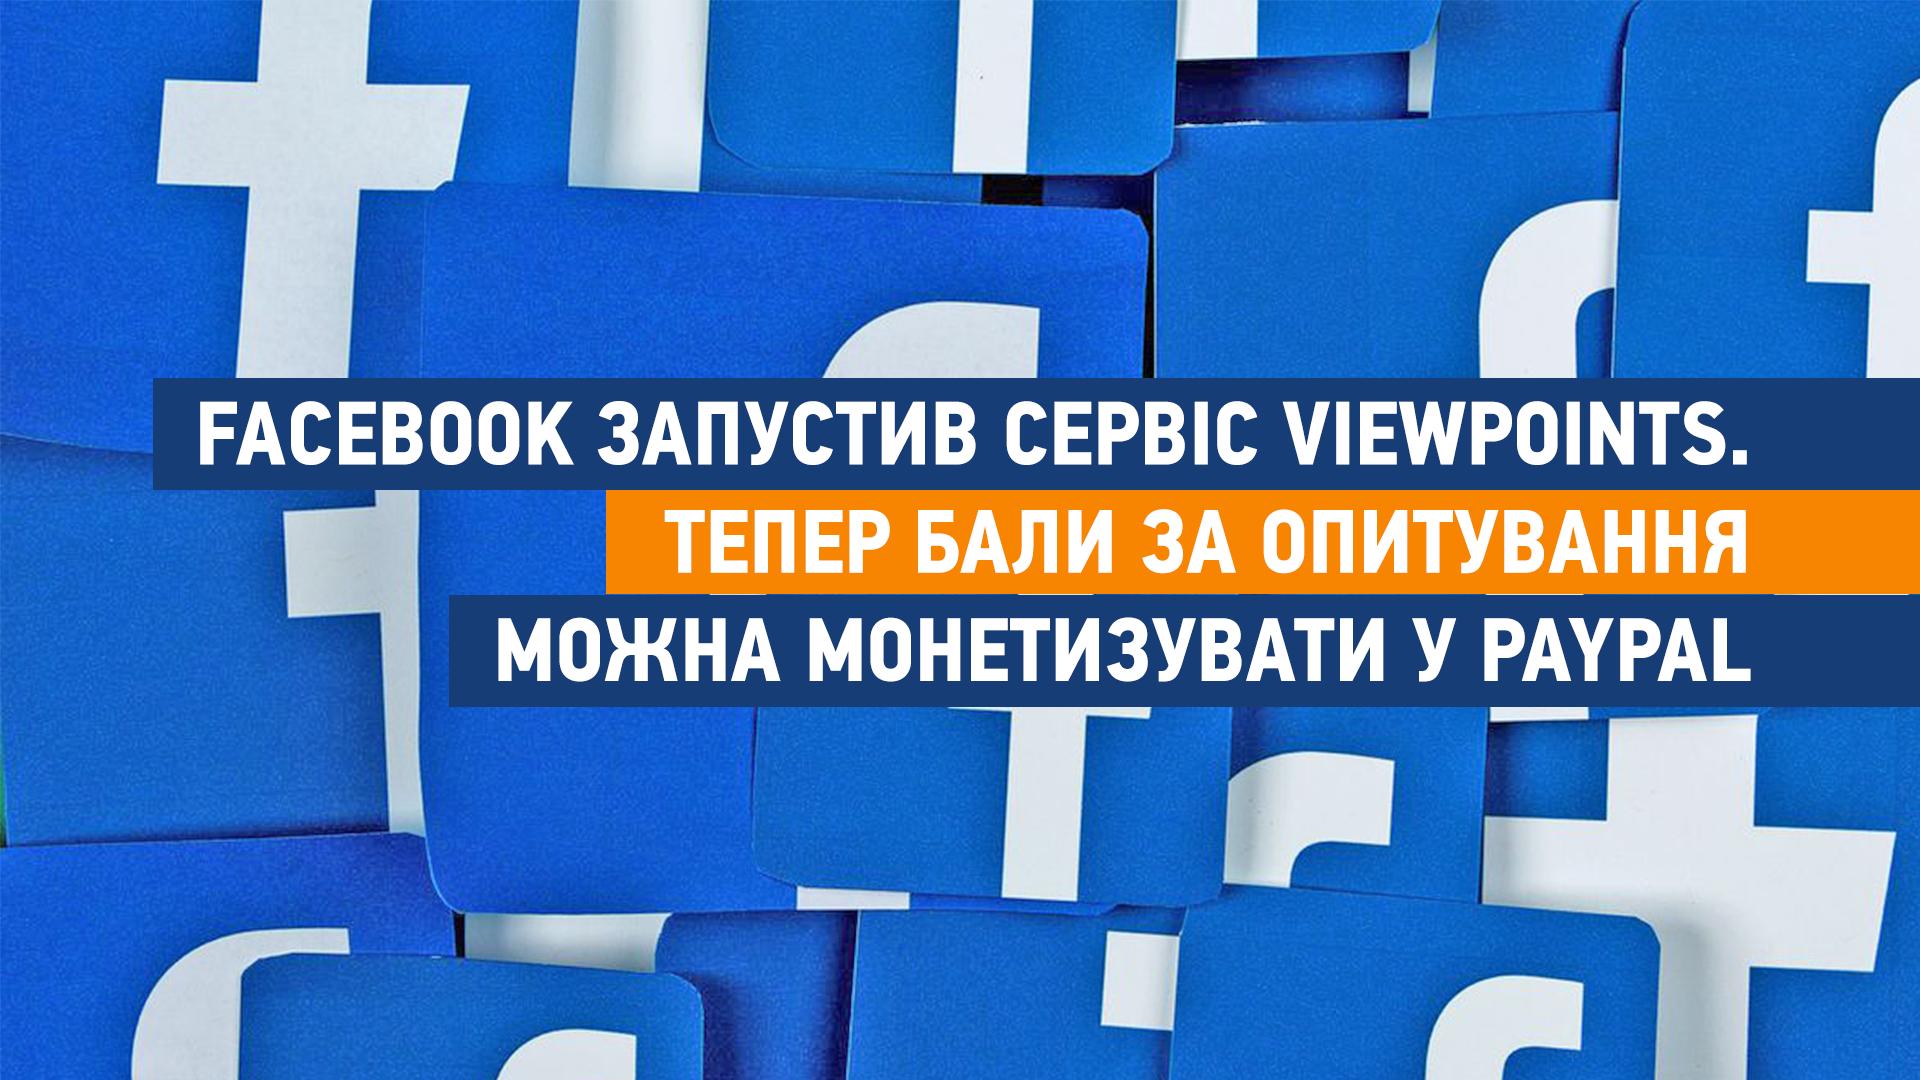 Facebook запустив сервіс Viewpoints. Тепер бали за опитування можна монетизувати у PayPal